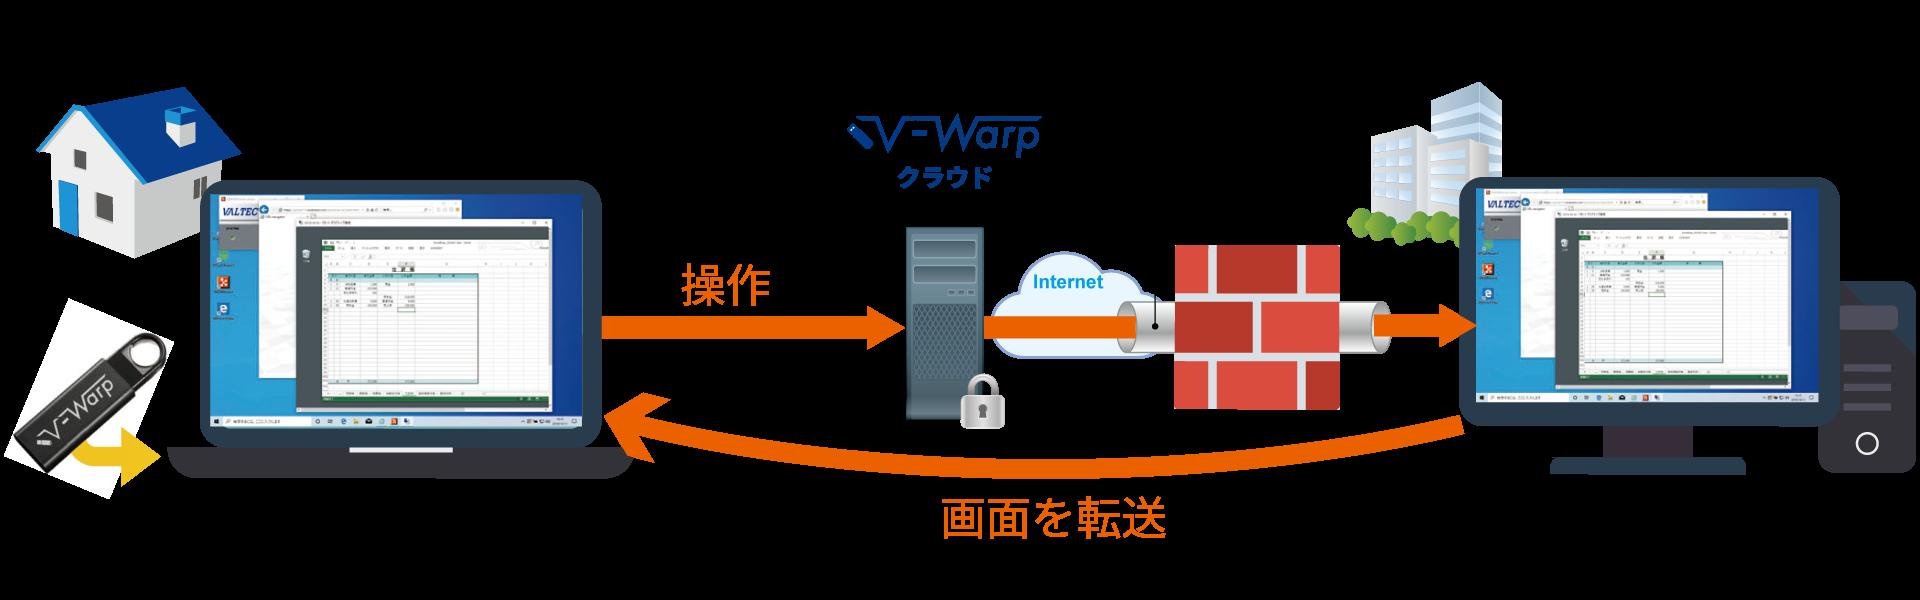 V-Warp利用イメージ